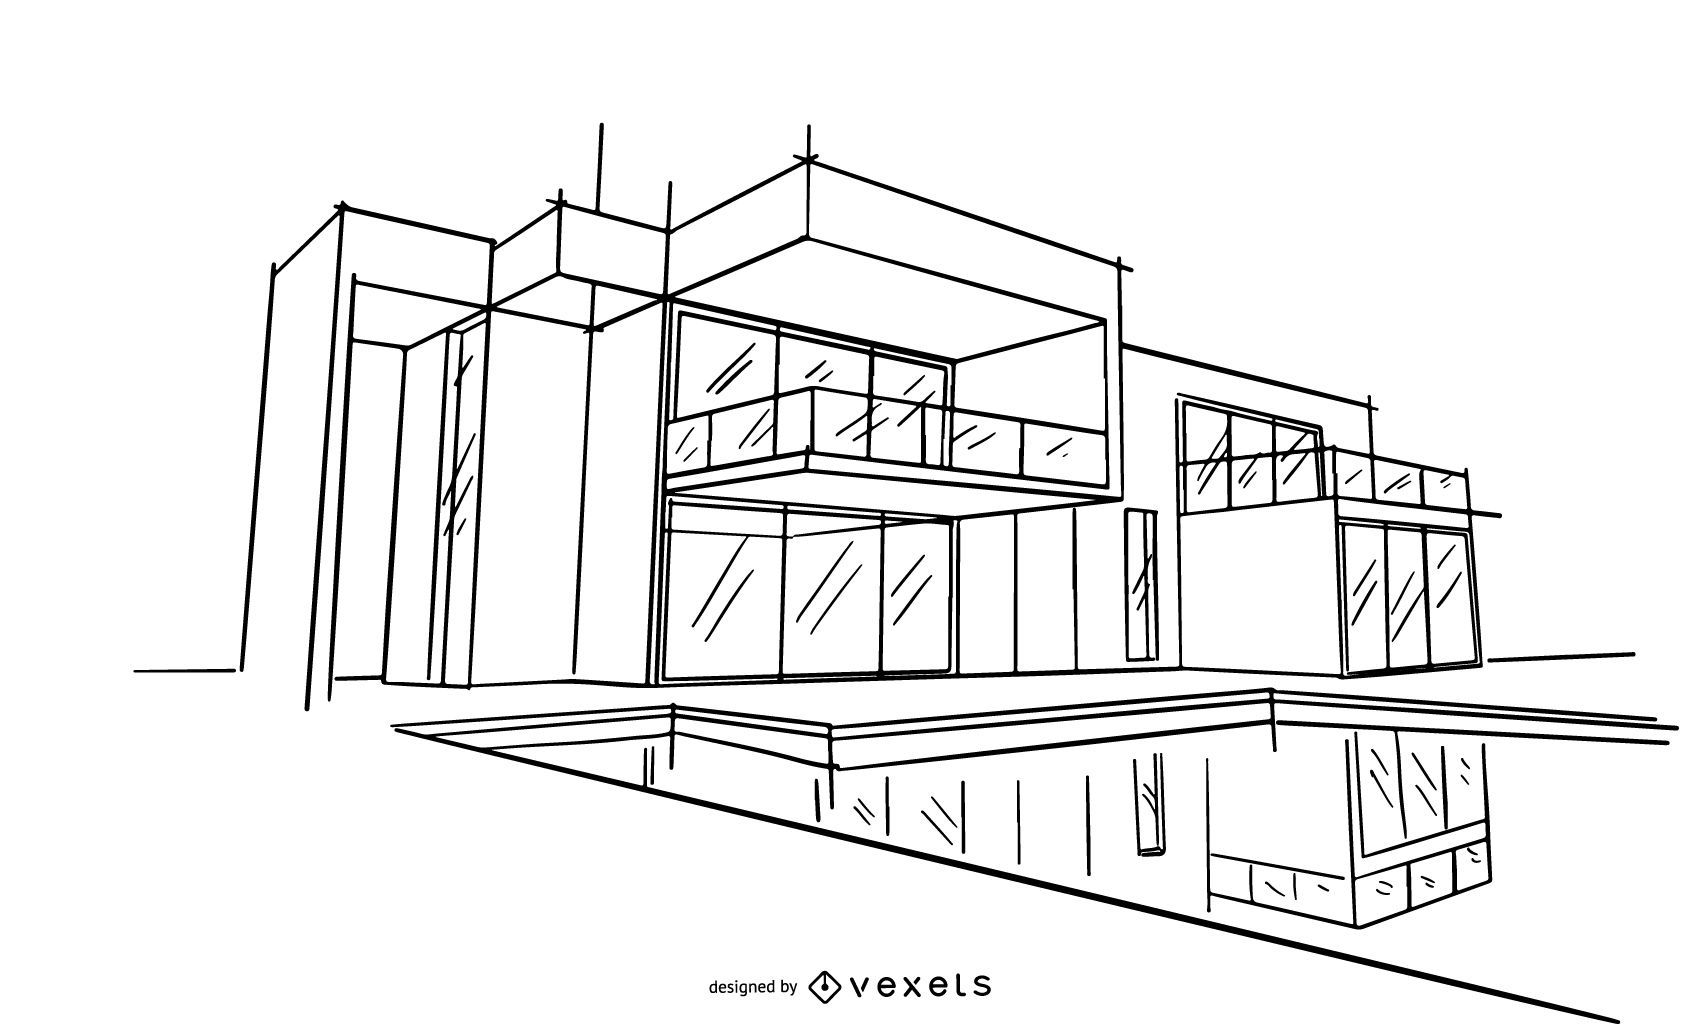 Architecture Design Sketch Illustration